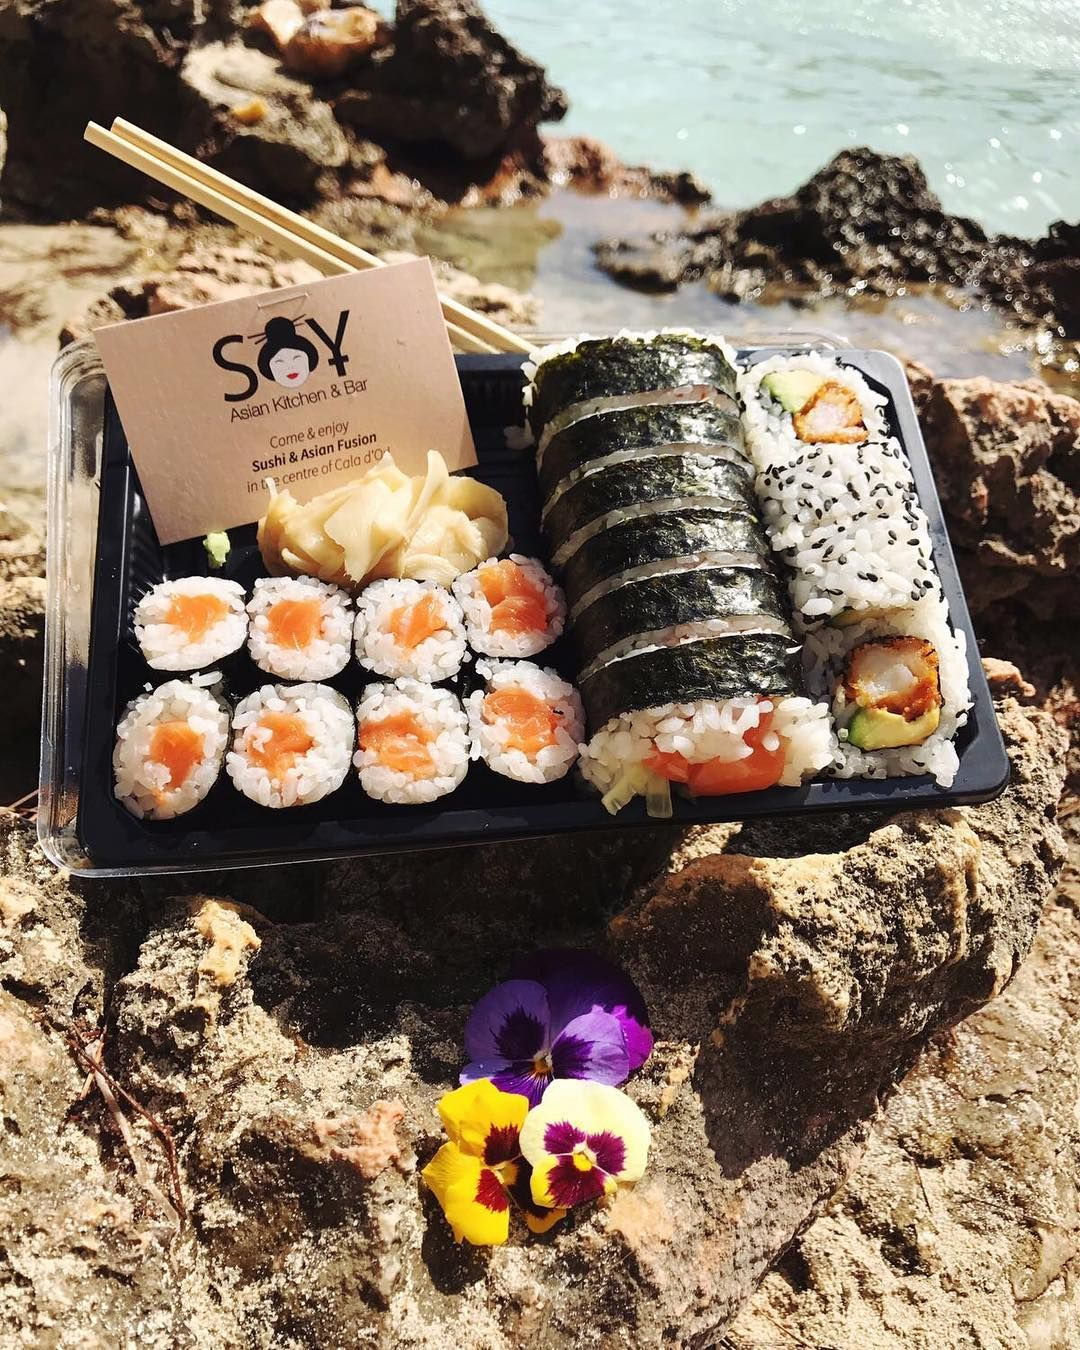 The Perfect Combination Vamos A La Playa Picknick Beach Takeaway Sushitime Sushi Sushitakeaway Beachvibes Weekendmode Happysatur Food Recipes Sushi